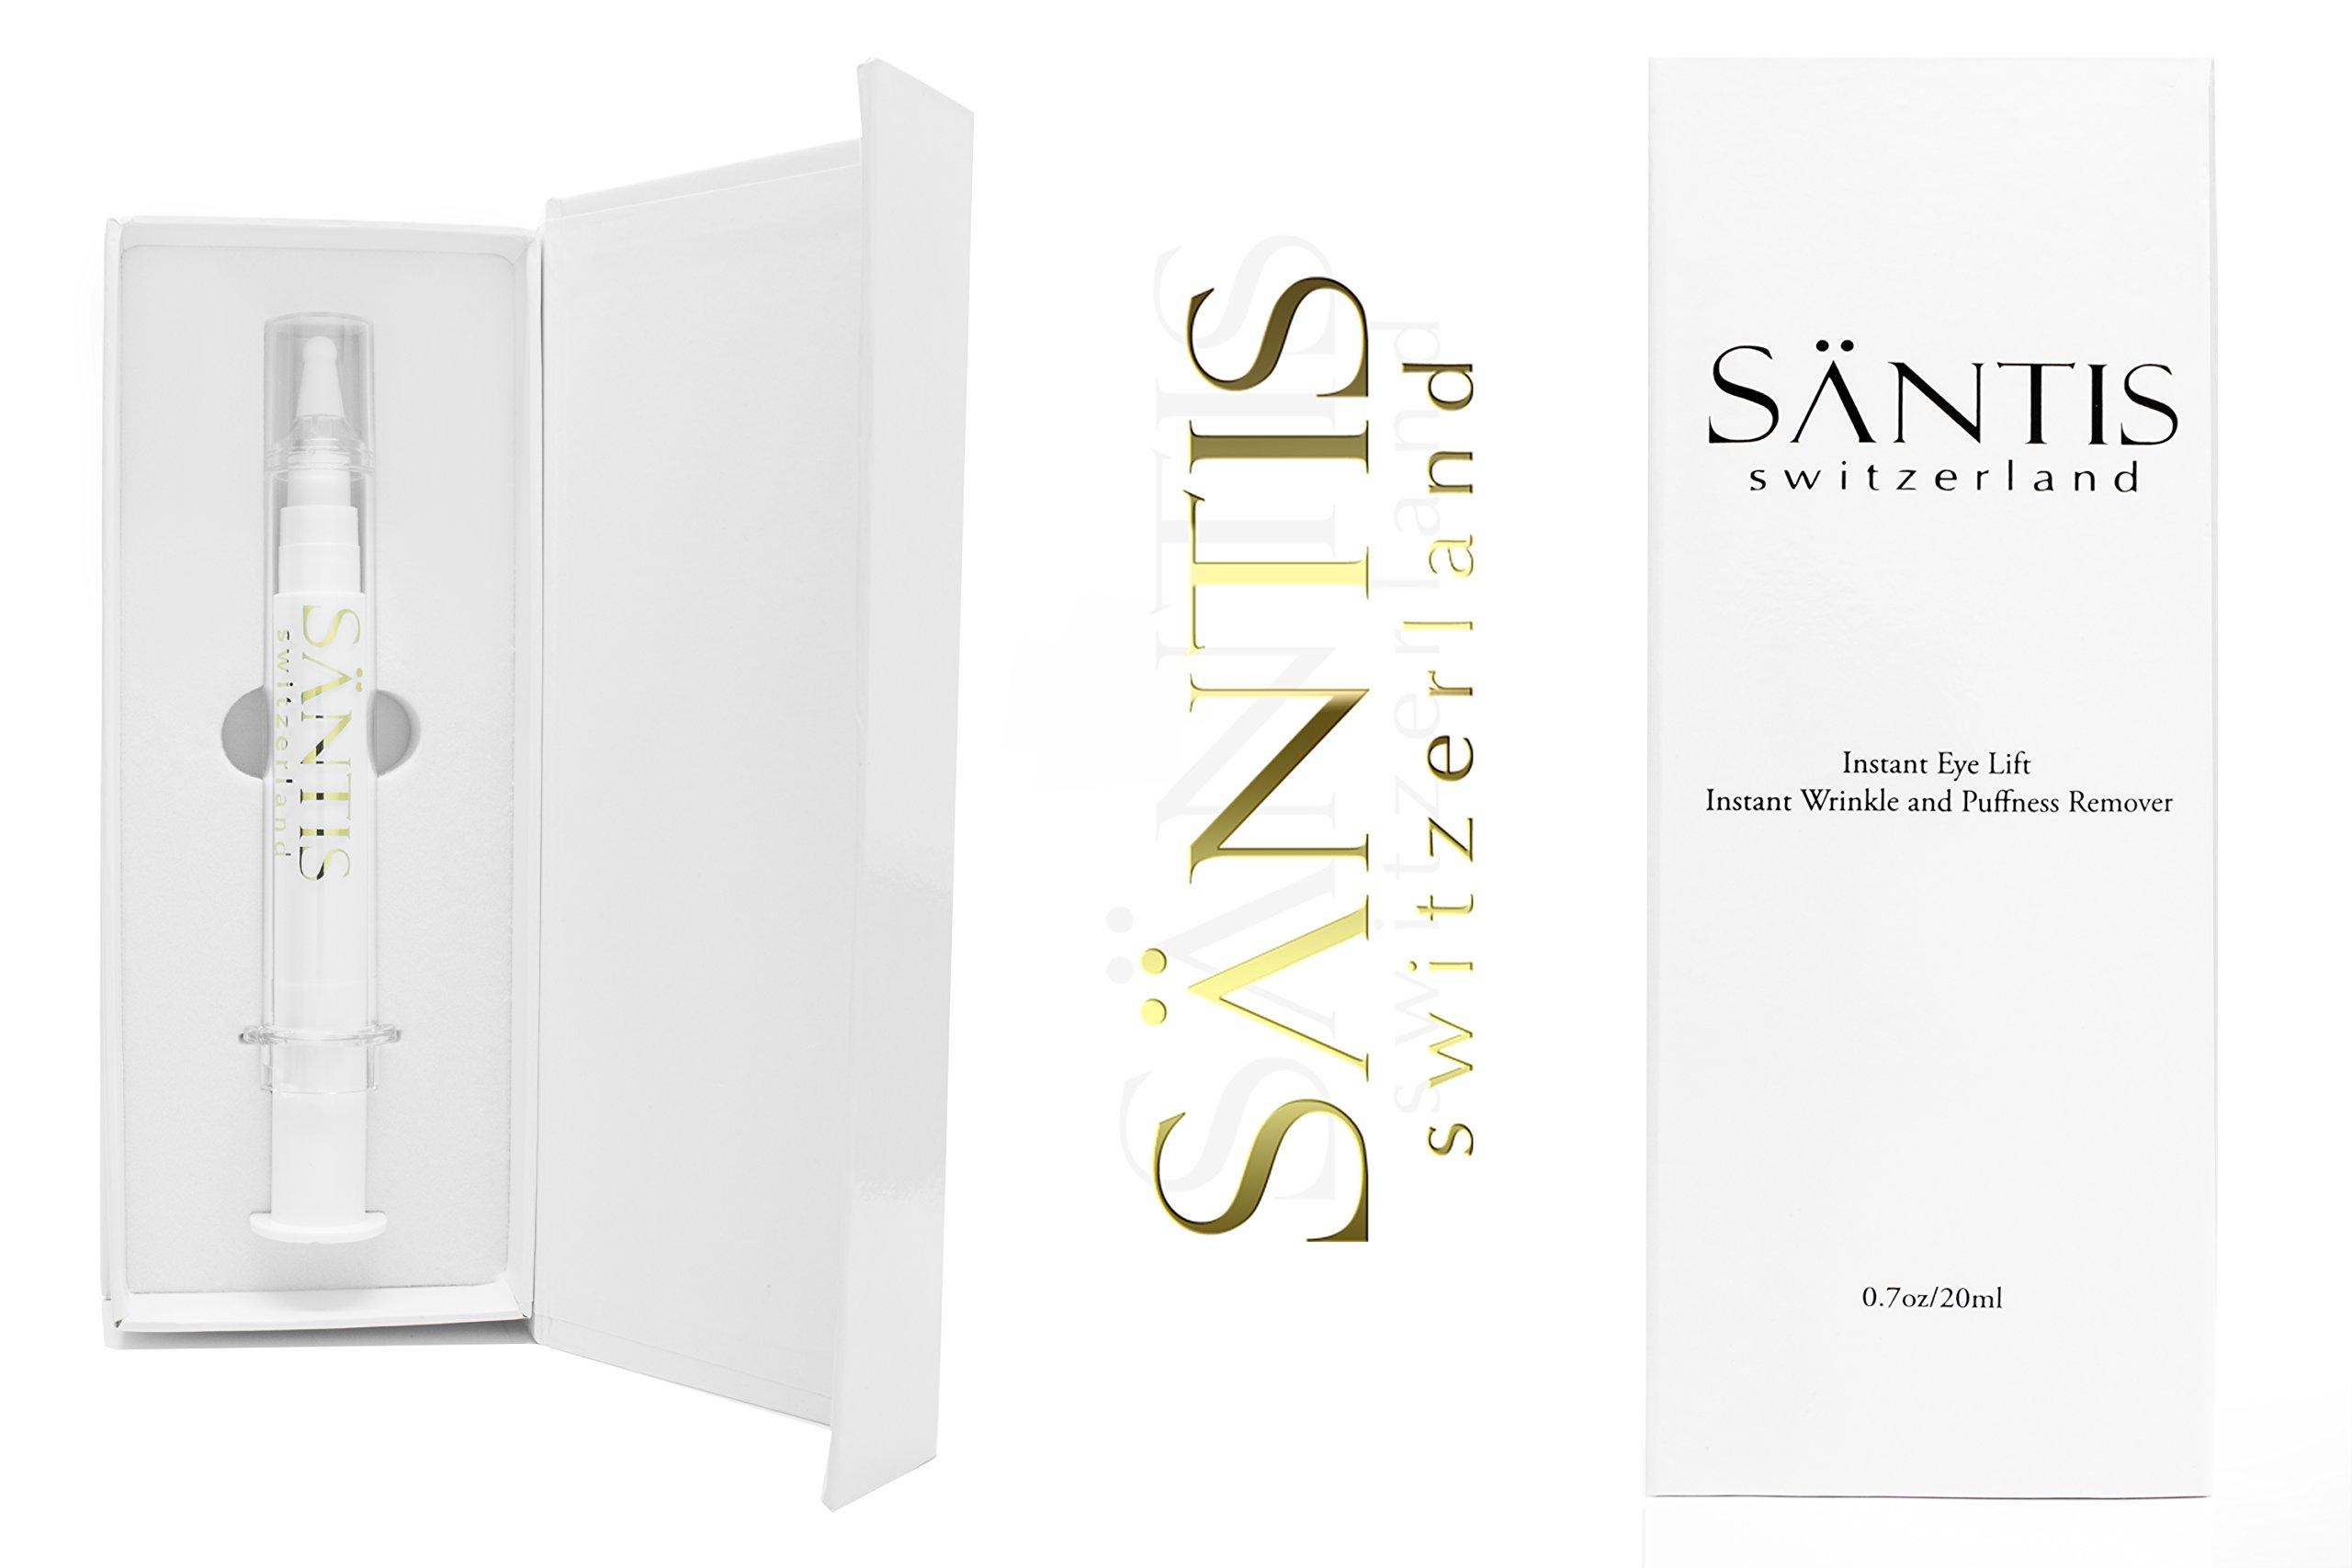 Santis Botox Alternative Anti Wrinkle Filler Kit Contain Cellular Serum & Filling Cream Tightens Skin Instantly & Painlessly - Eliminates Age Spots, Dark Circles, Smoothens Fine Lines